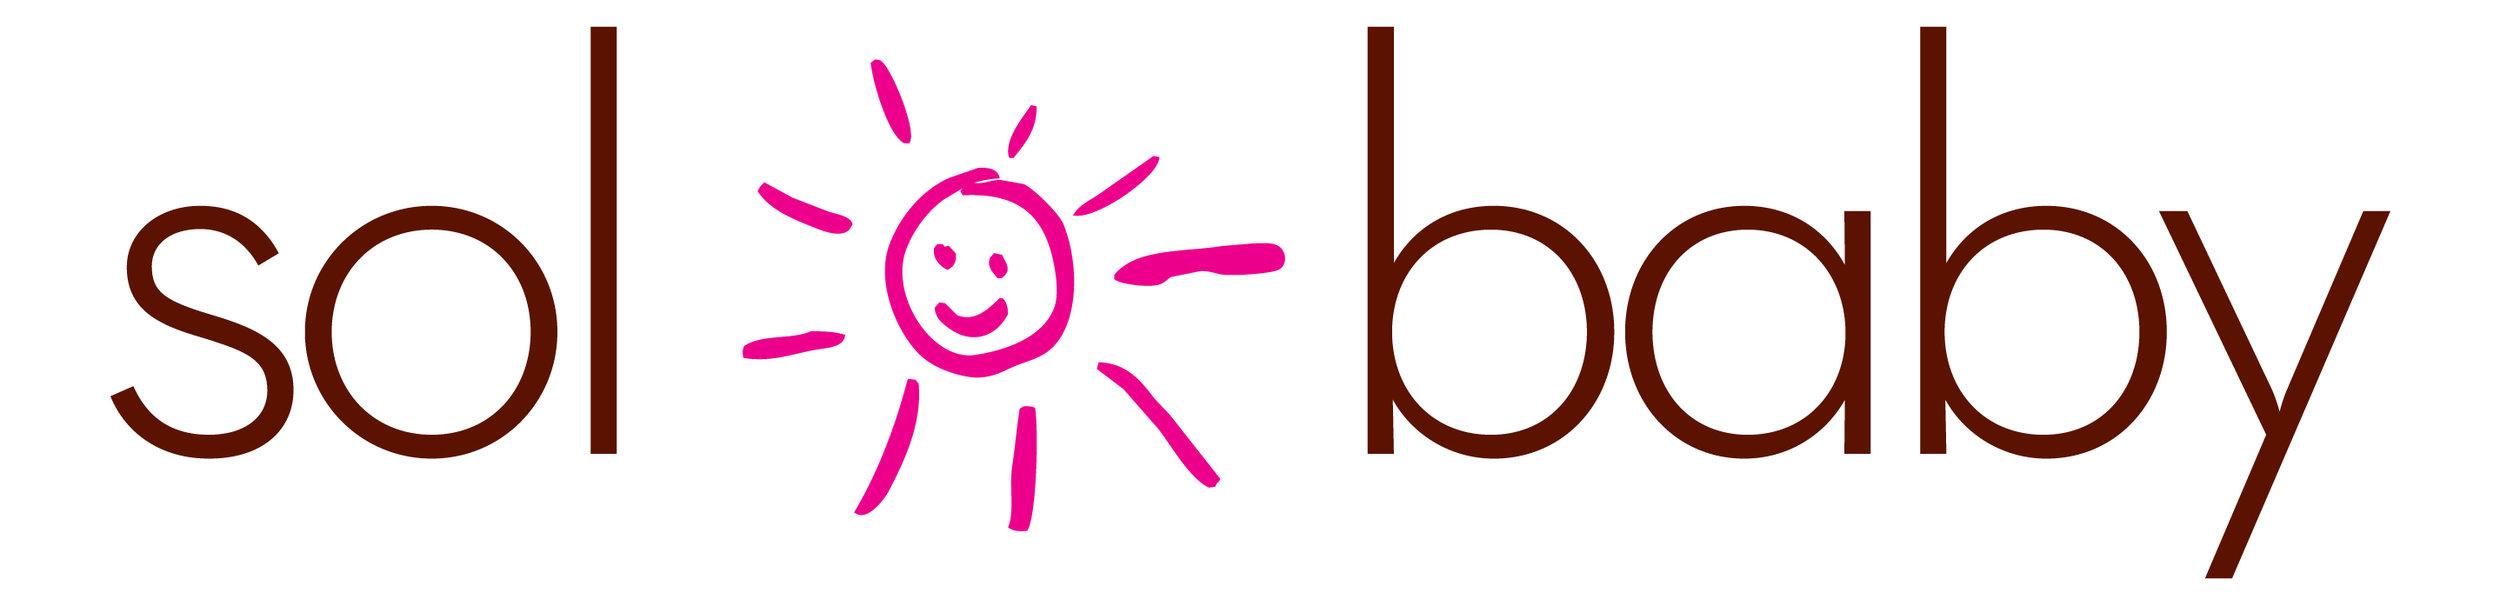 sol-baby-logo-good.JPG